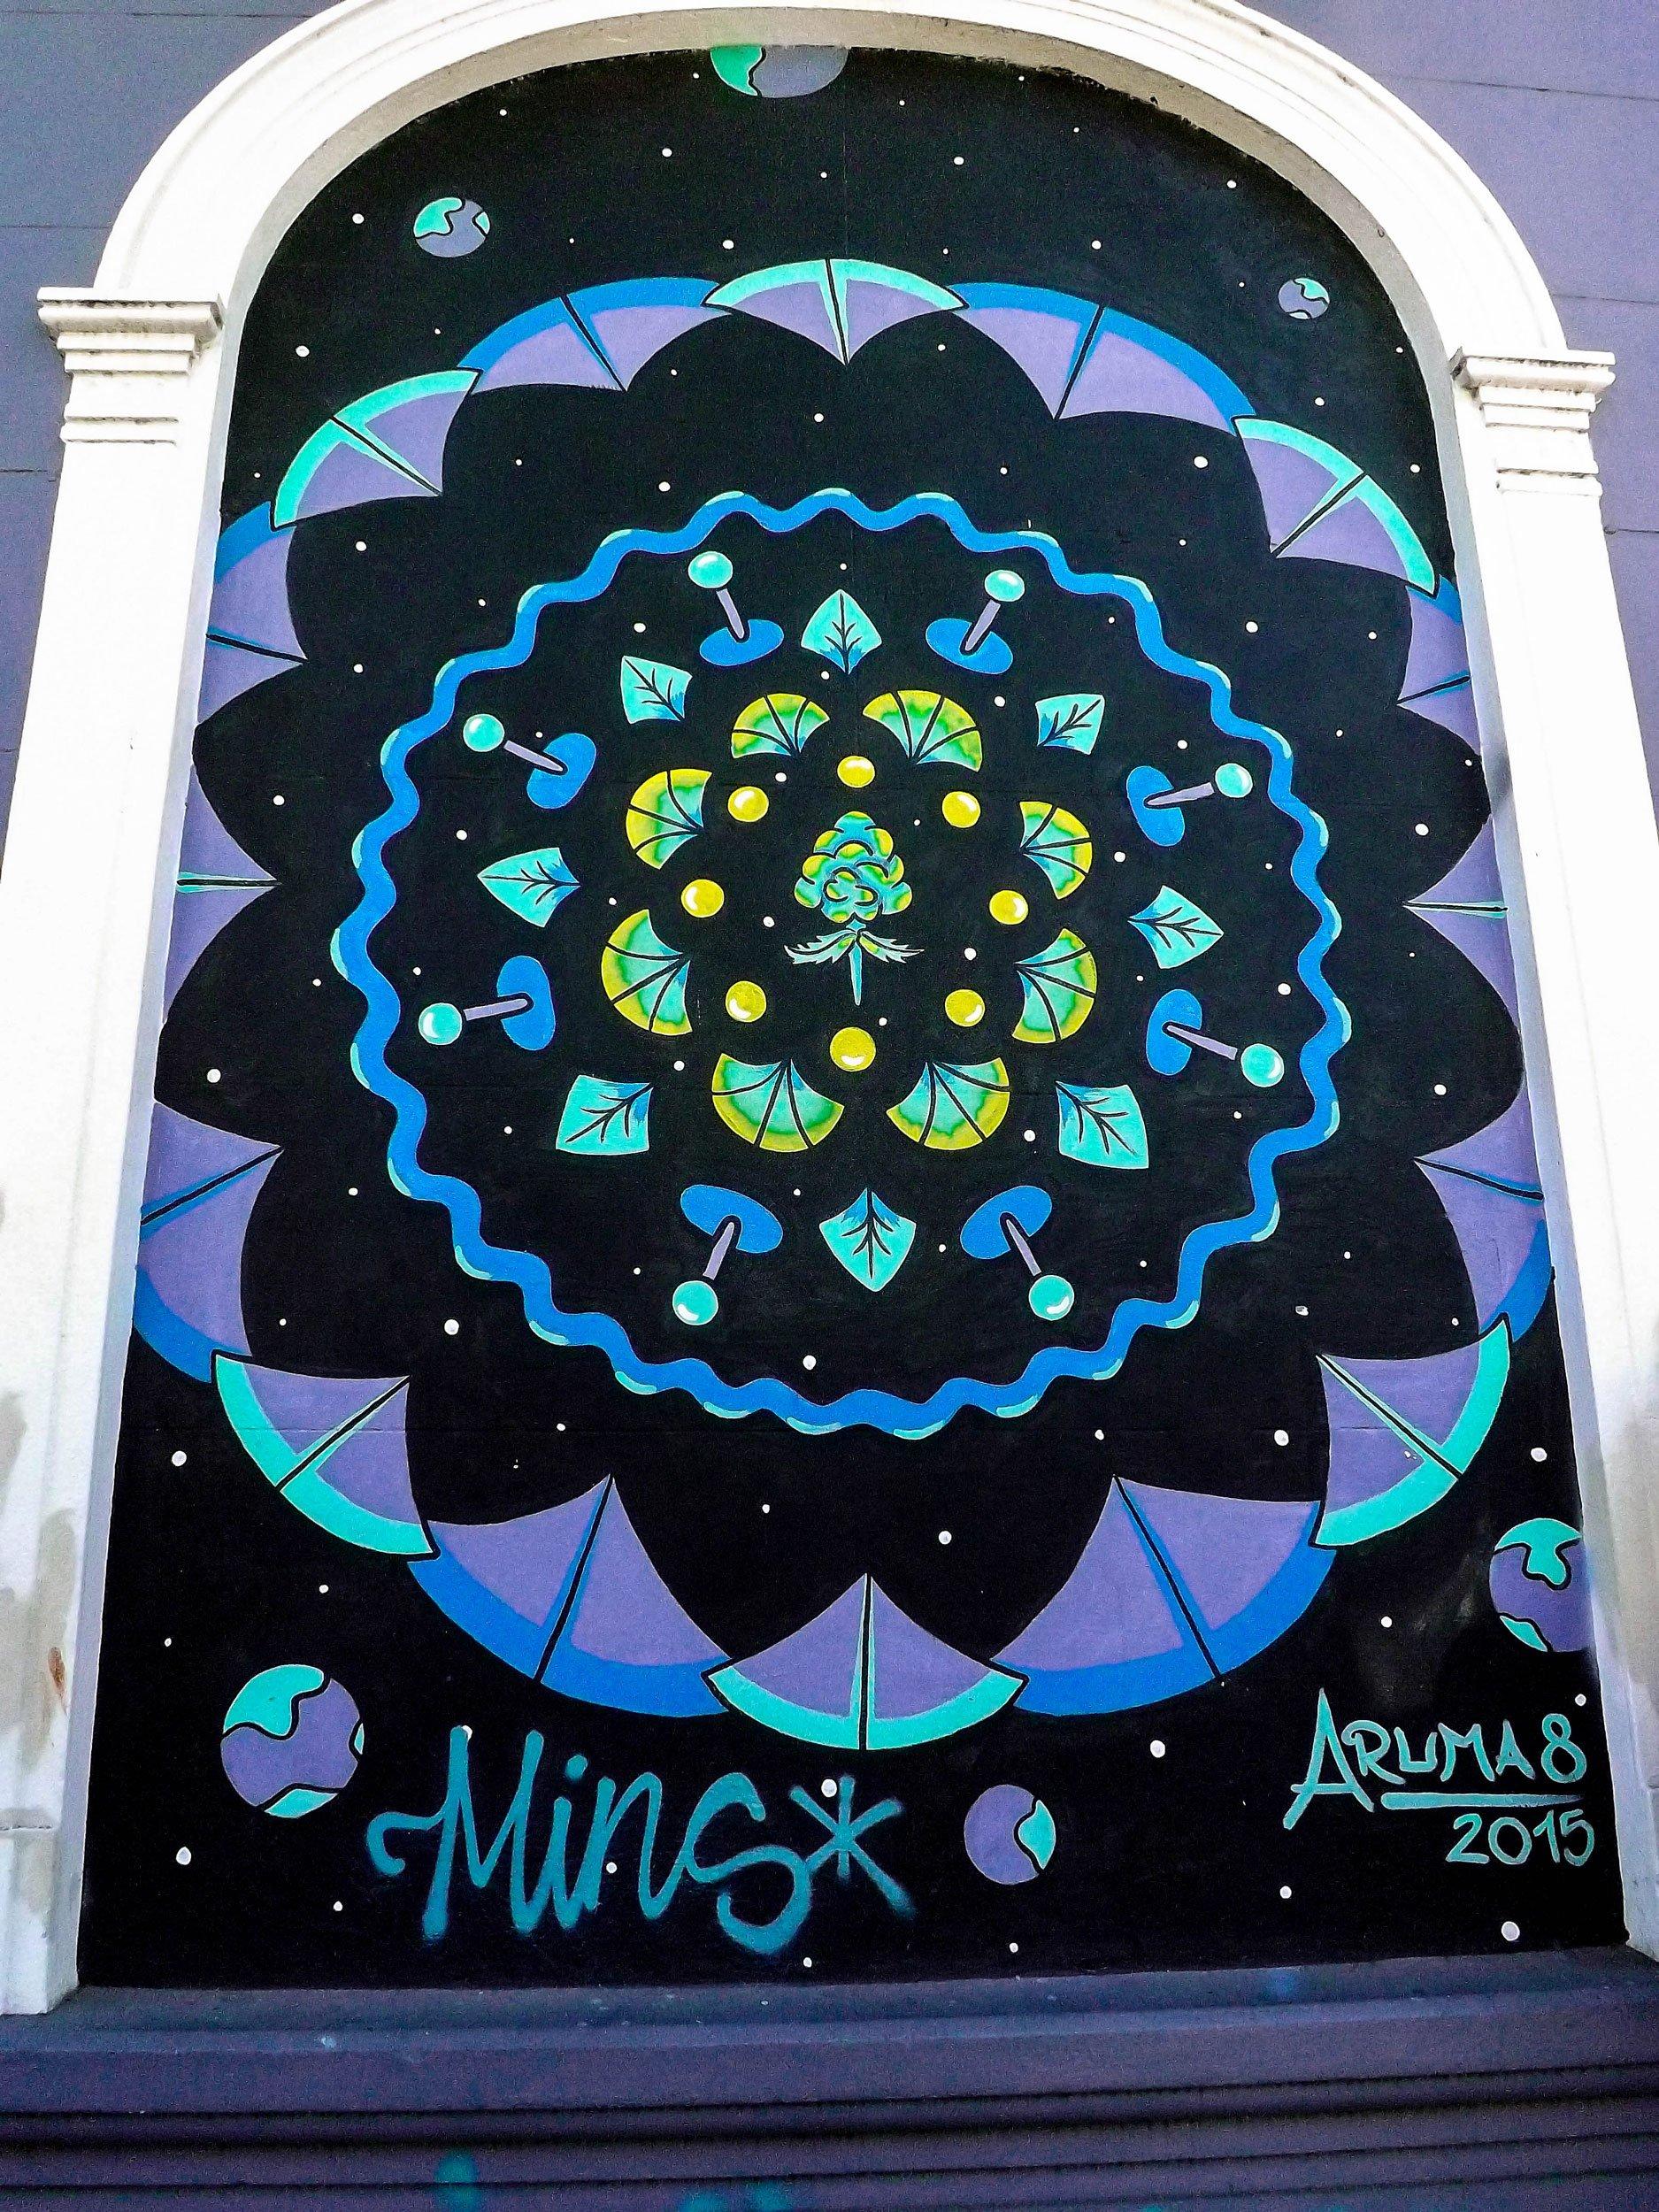 mural by Aruma 8 Buenos Aires | Best Street Art Cities